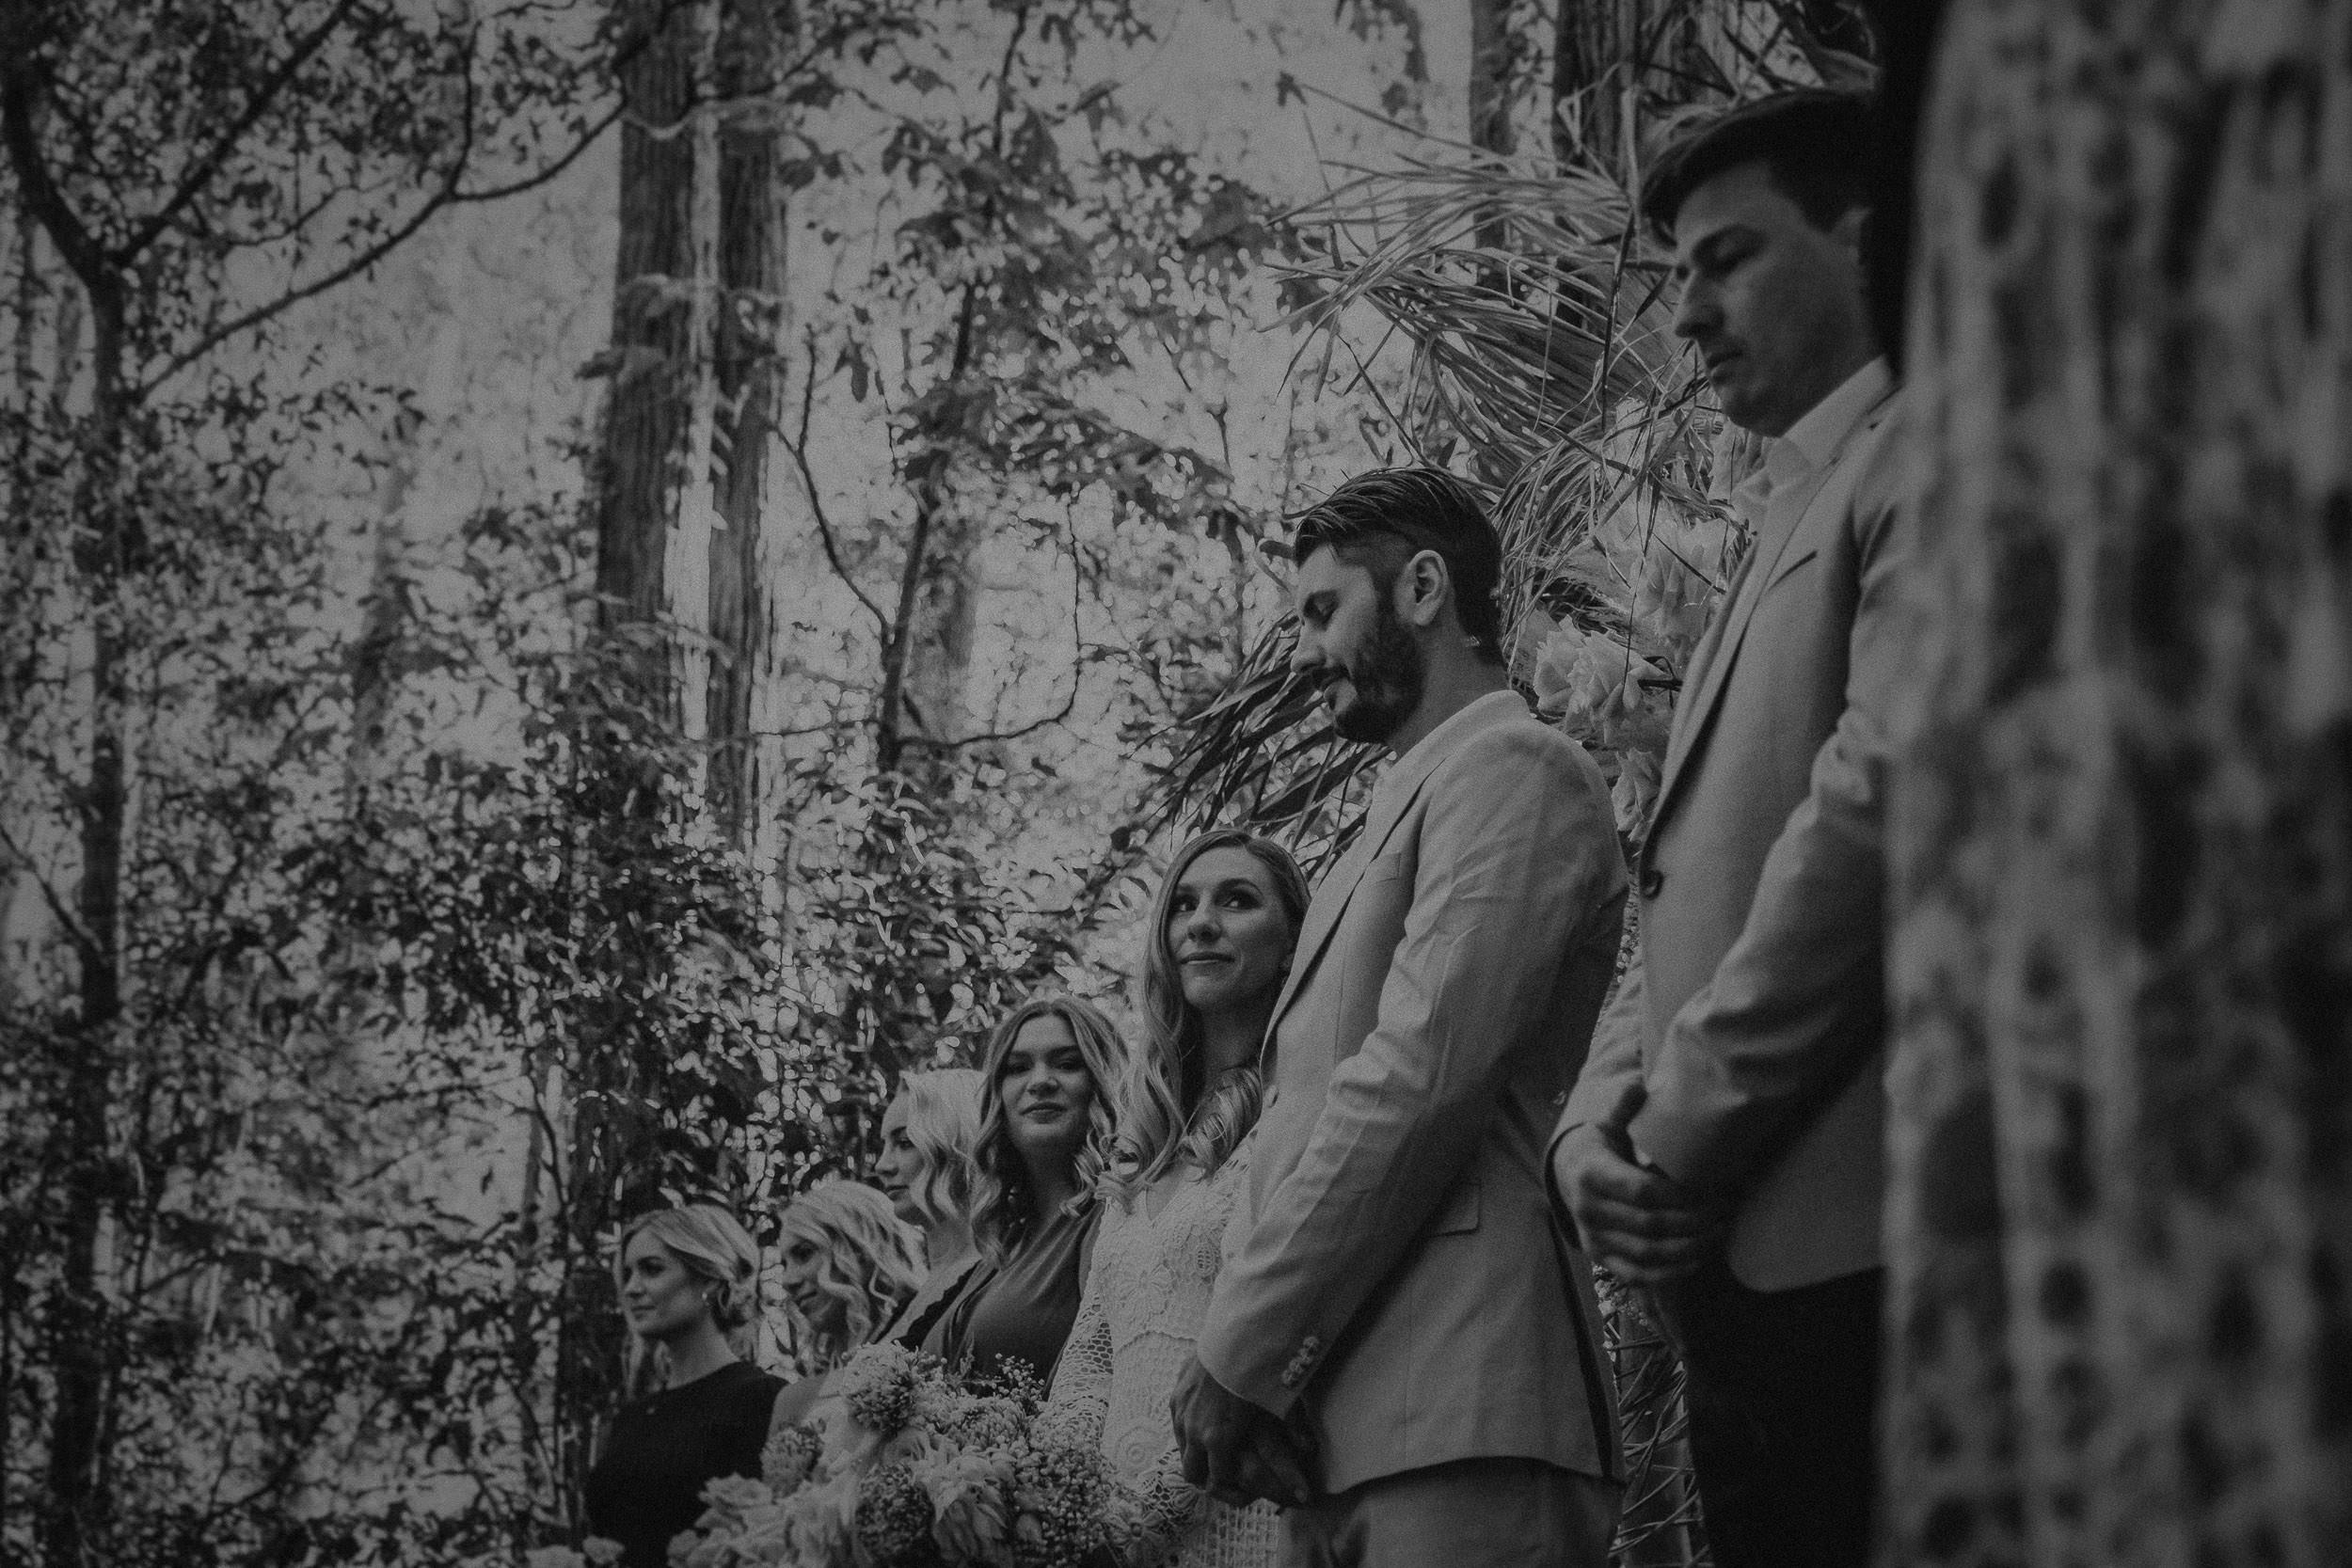 S&A Elopement - Kings & Thieves - Shred 'Til Dead - Central Coast Beach Forest Wedding - 199.jpg